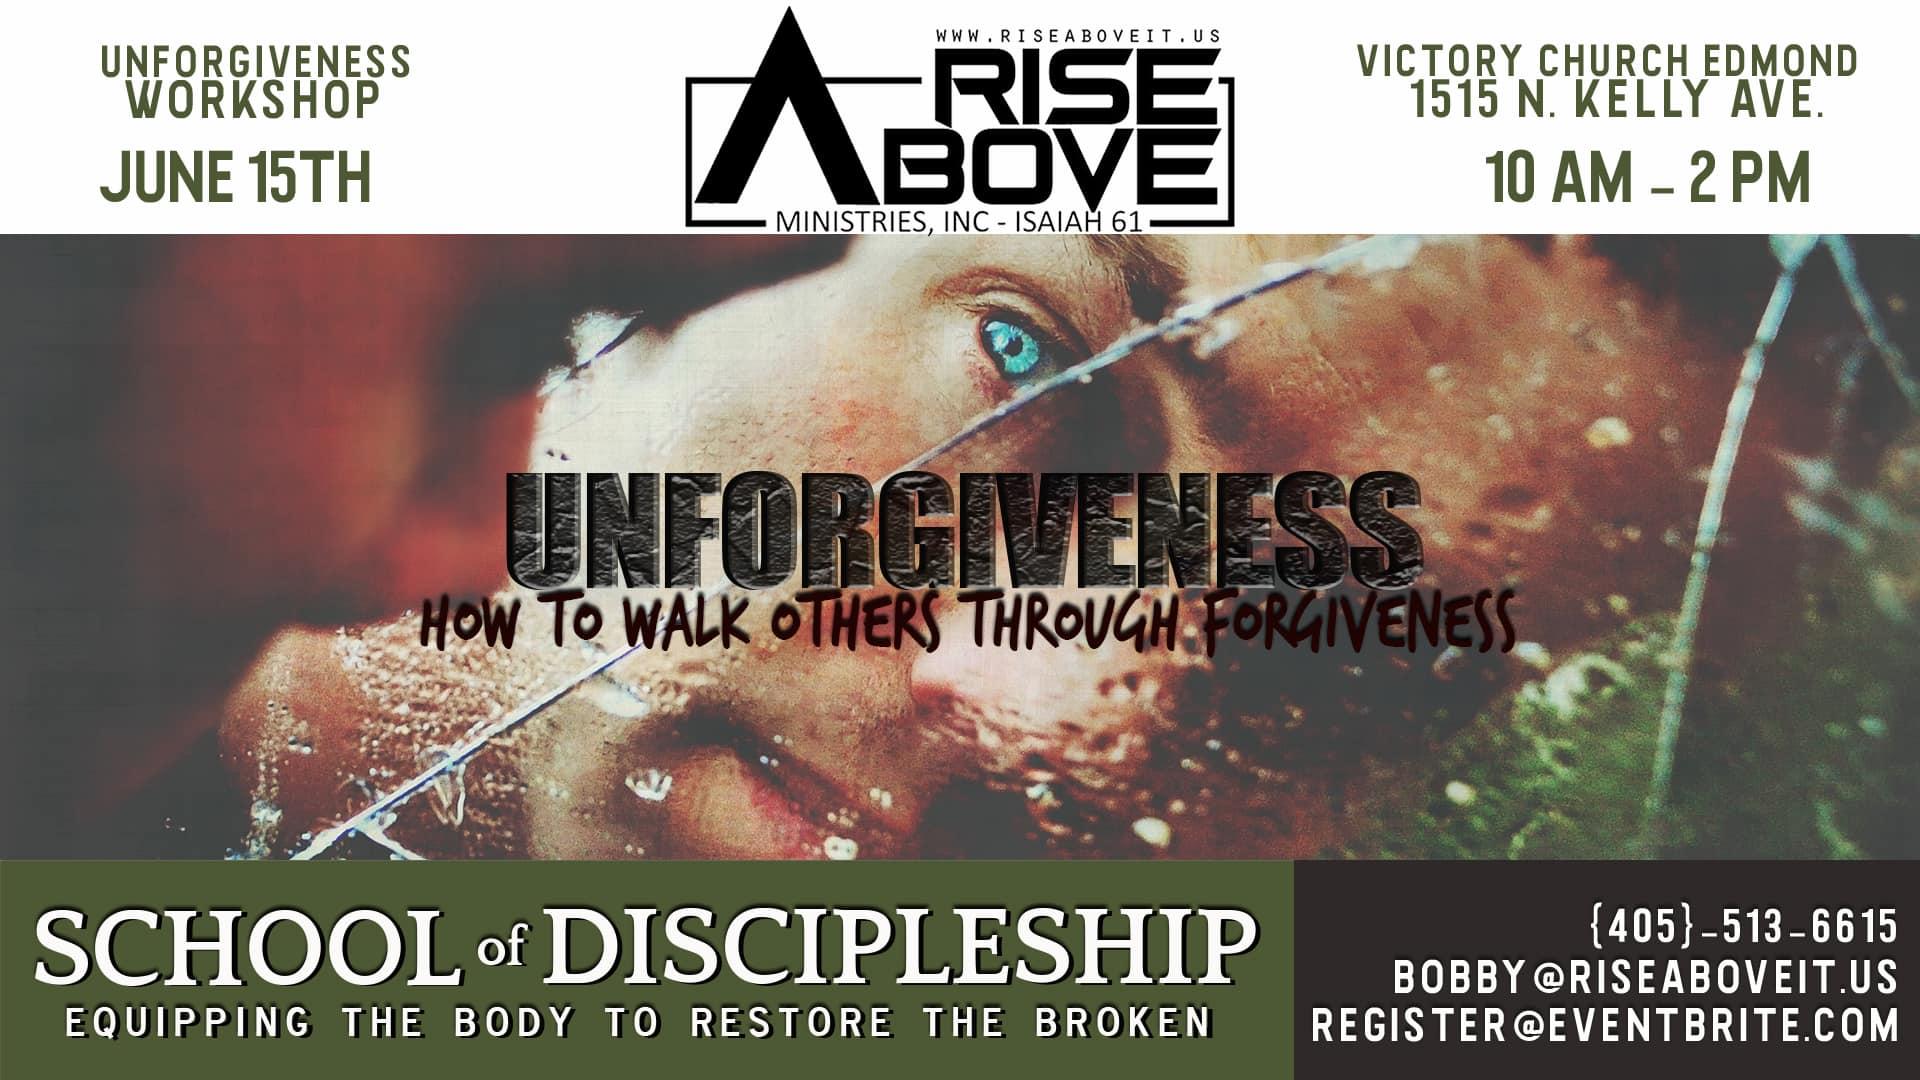 Unforgiveness Workshop